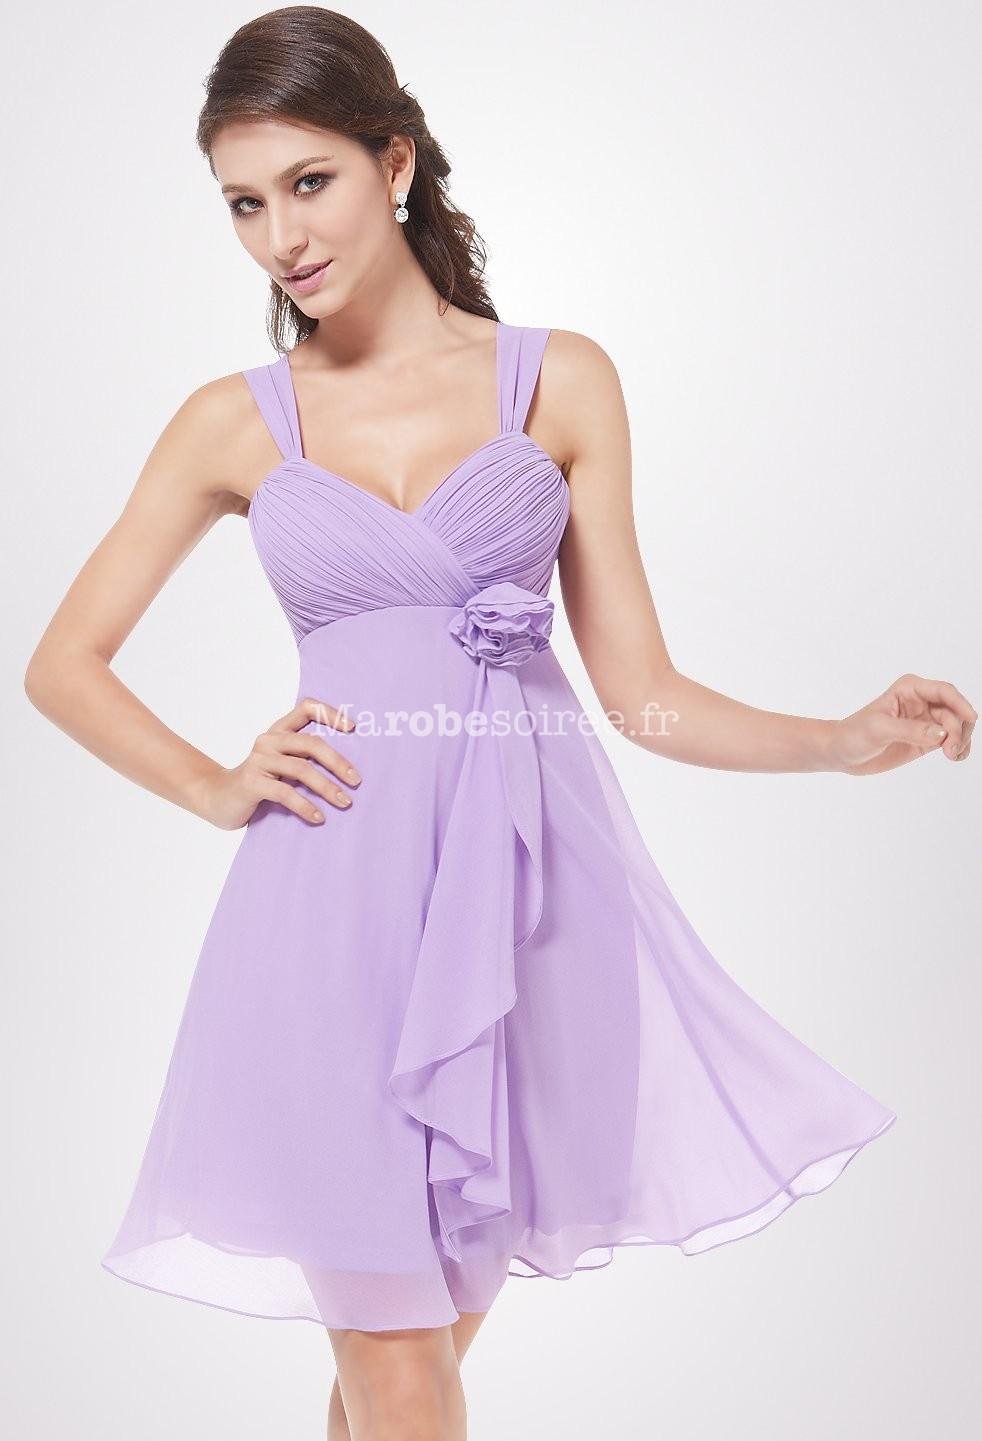 robe charleston mariage - Robe Charleston Mariage